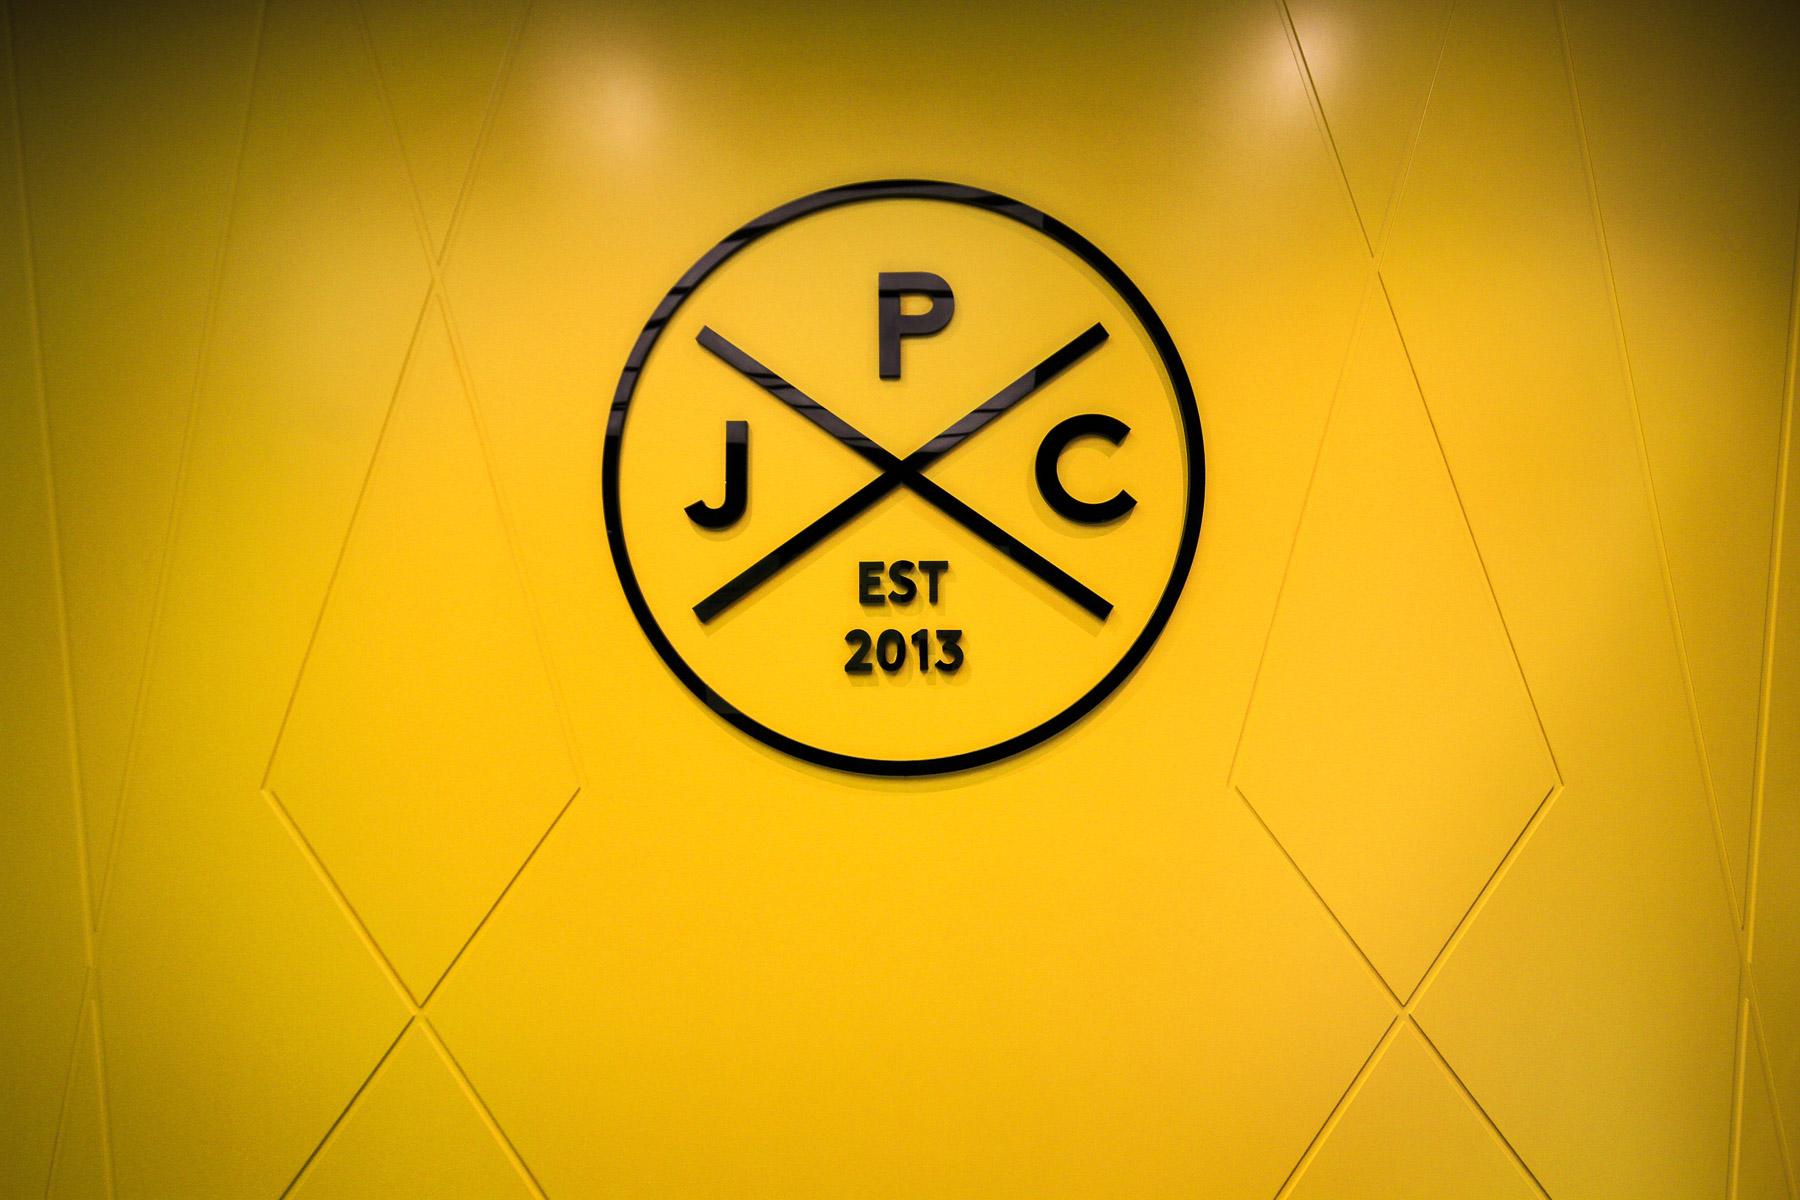 JPC_Highres_02.jpg